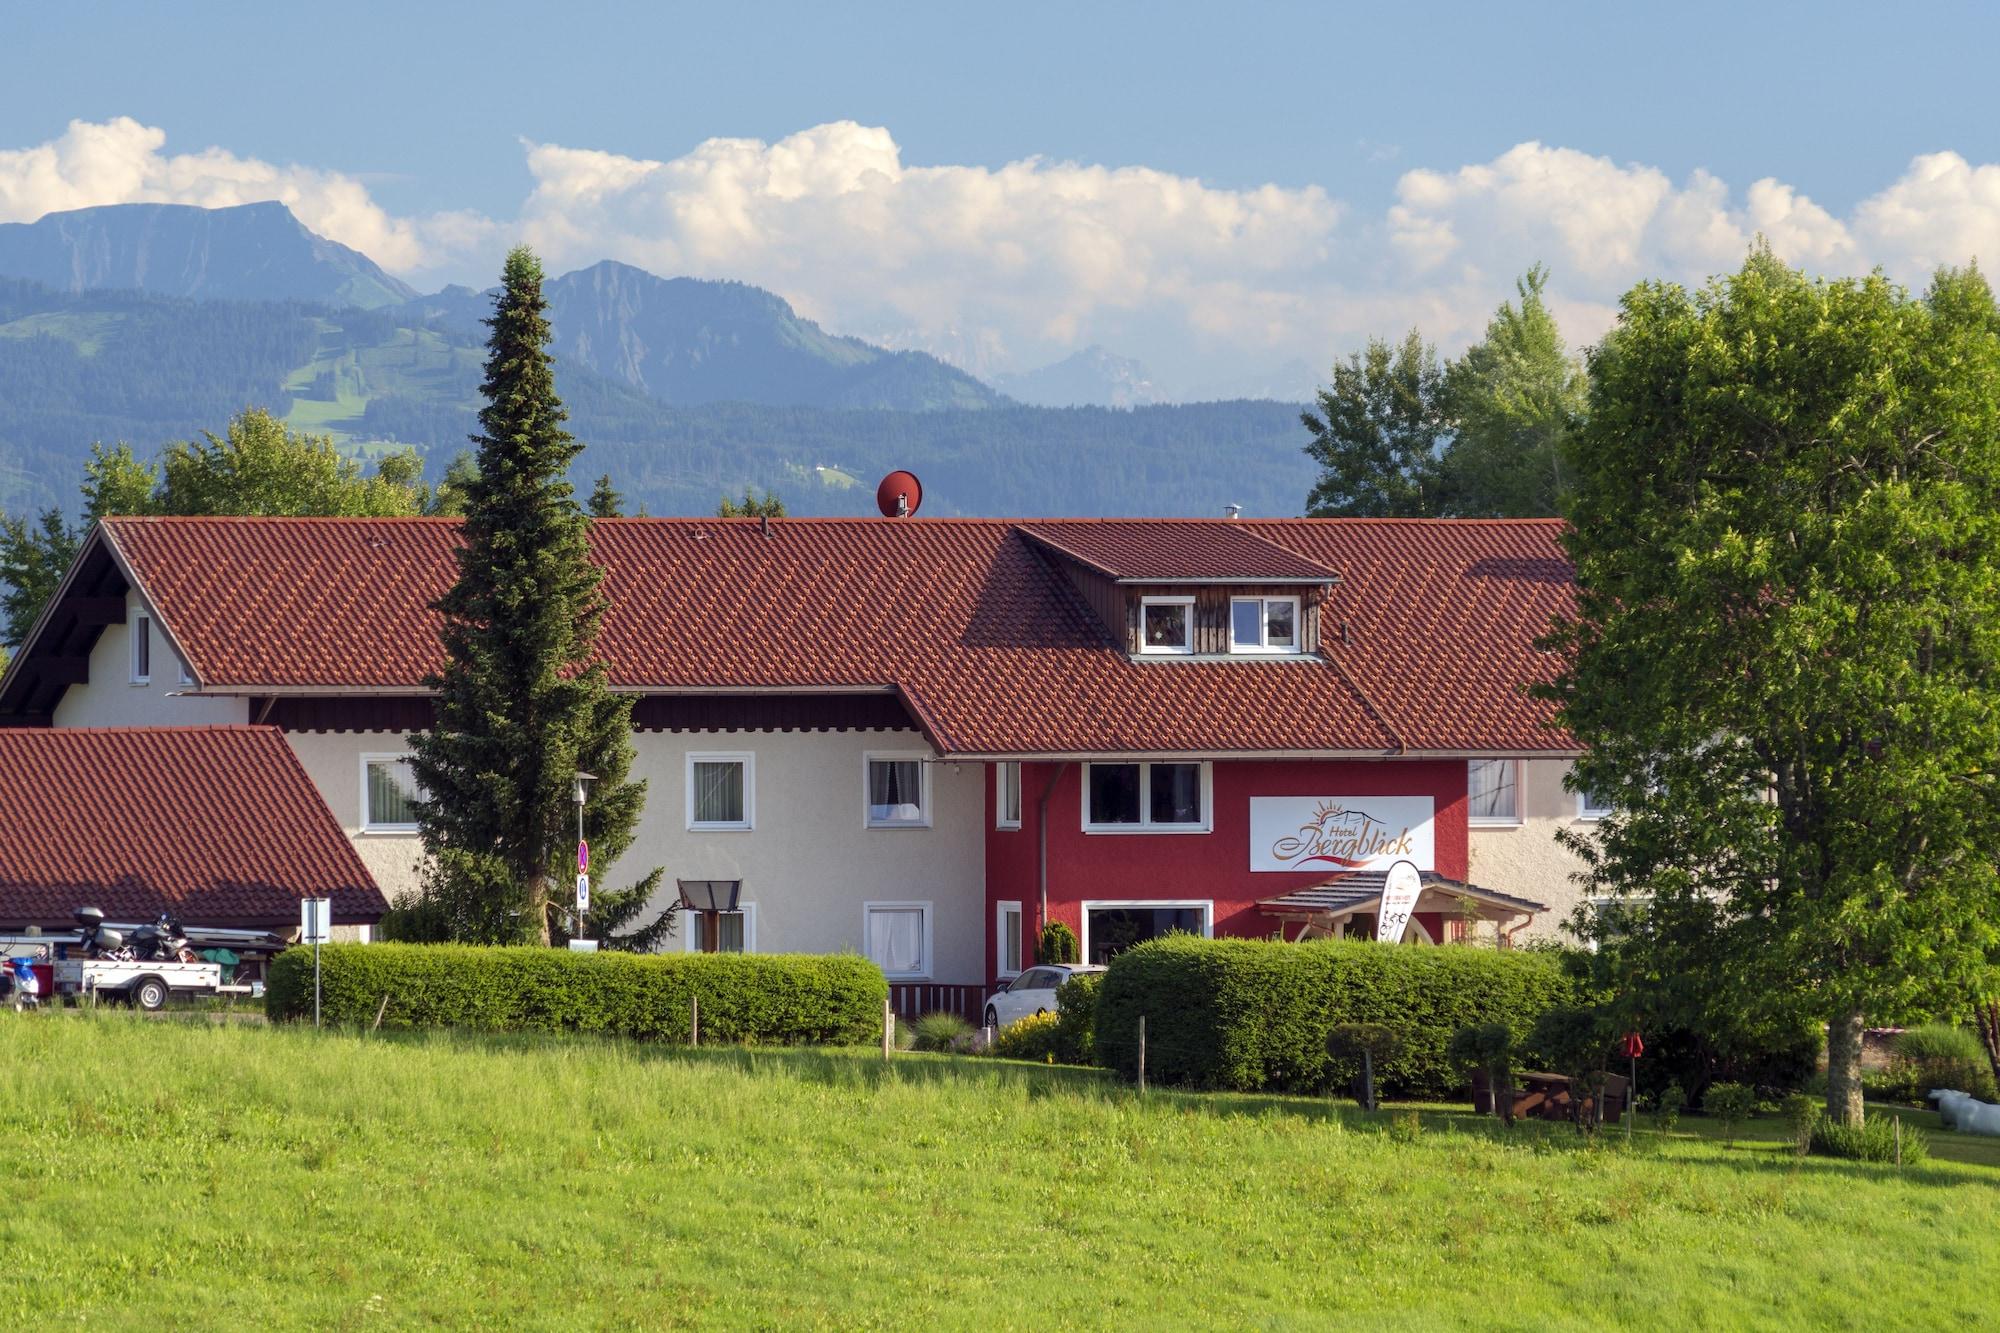 Hotel Bergblick, Lindau (Bodensee)